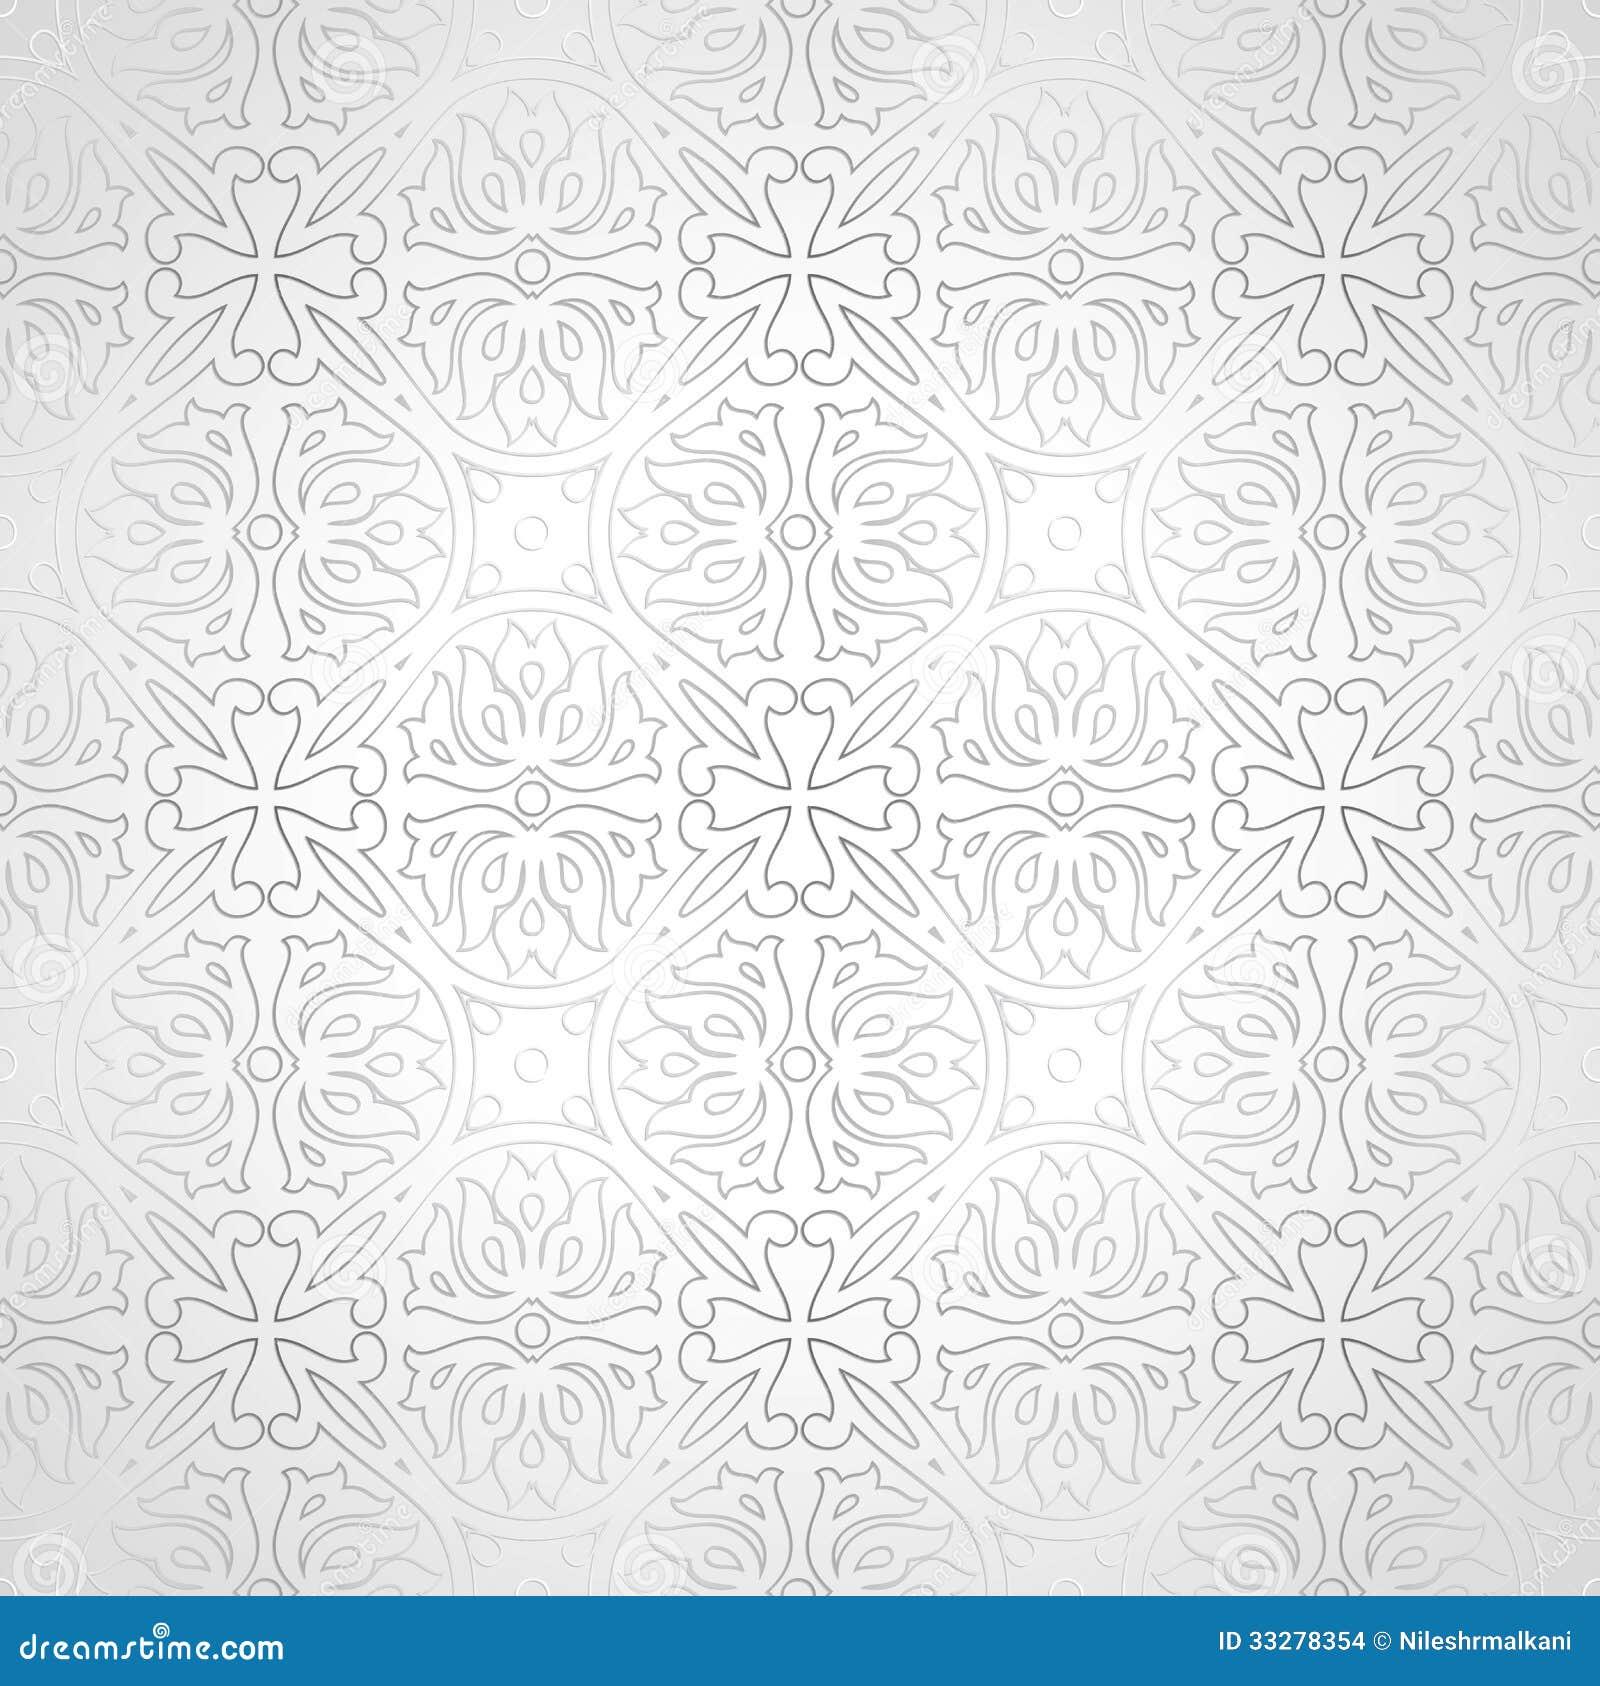 papel pintado lujoso incons til de plata imagenes de On papel pintado lujoso